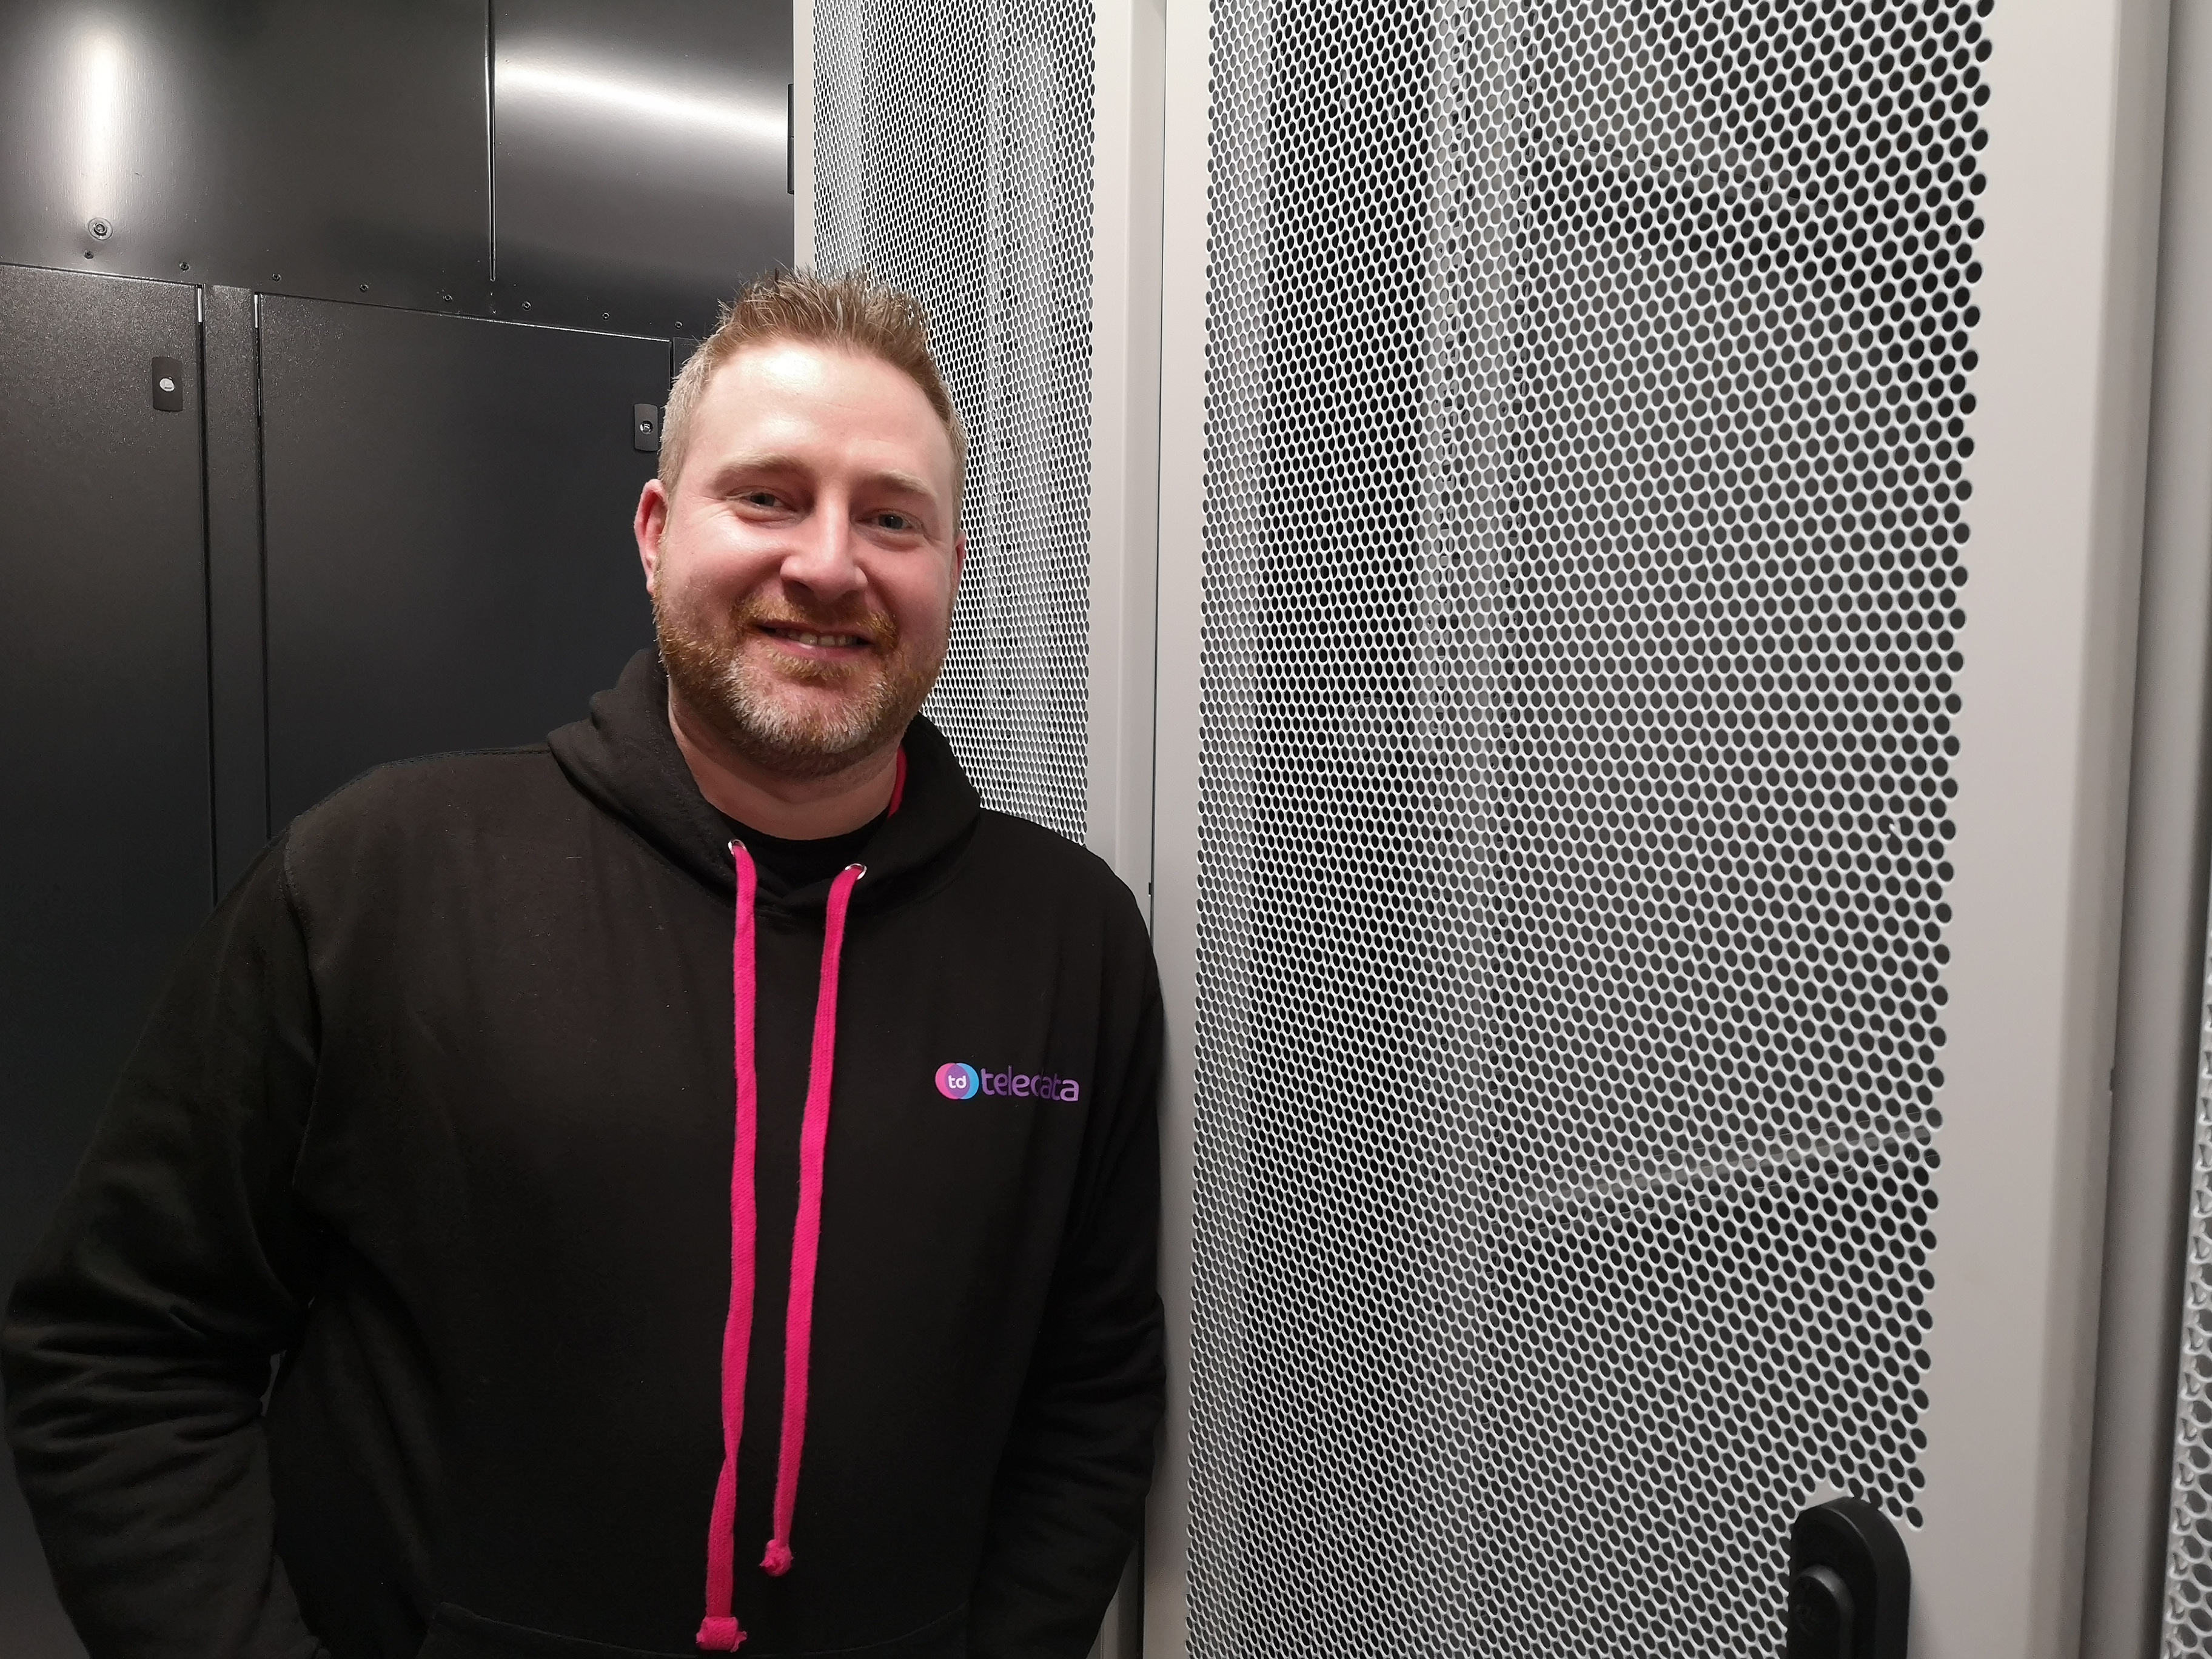 Dan Akister - Digital Marketing Manager